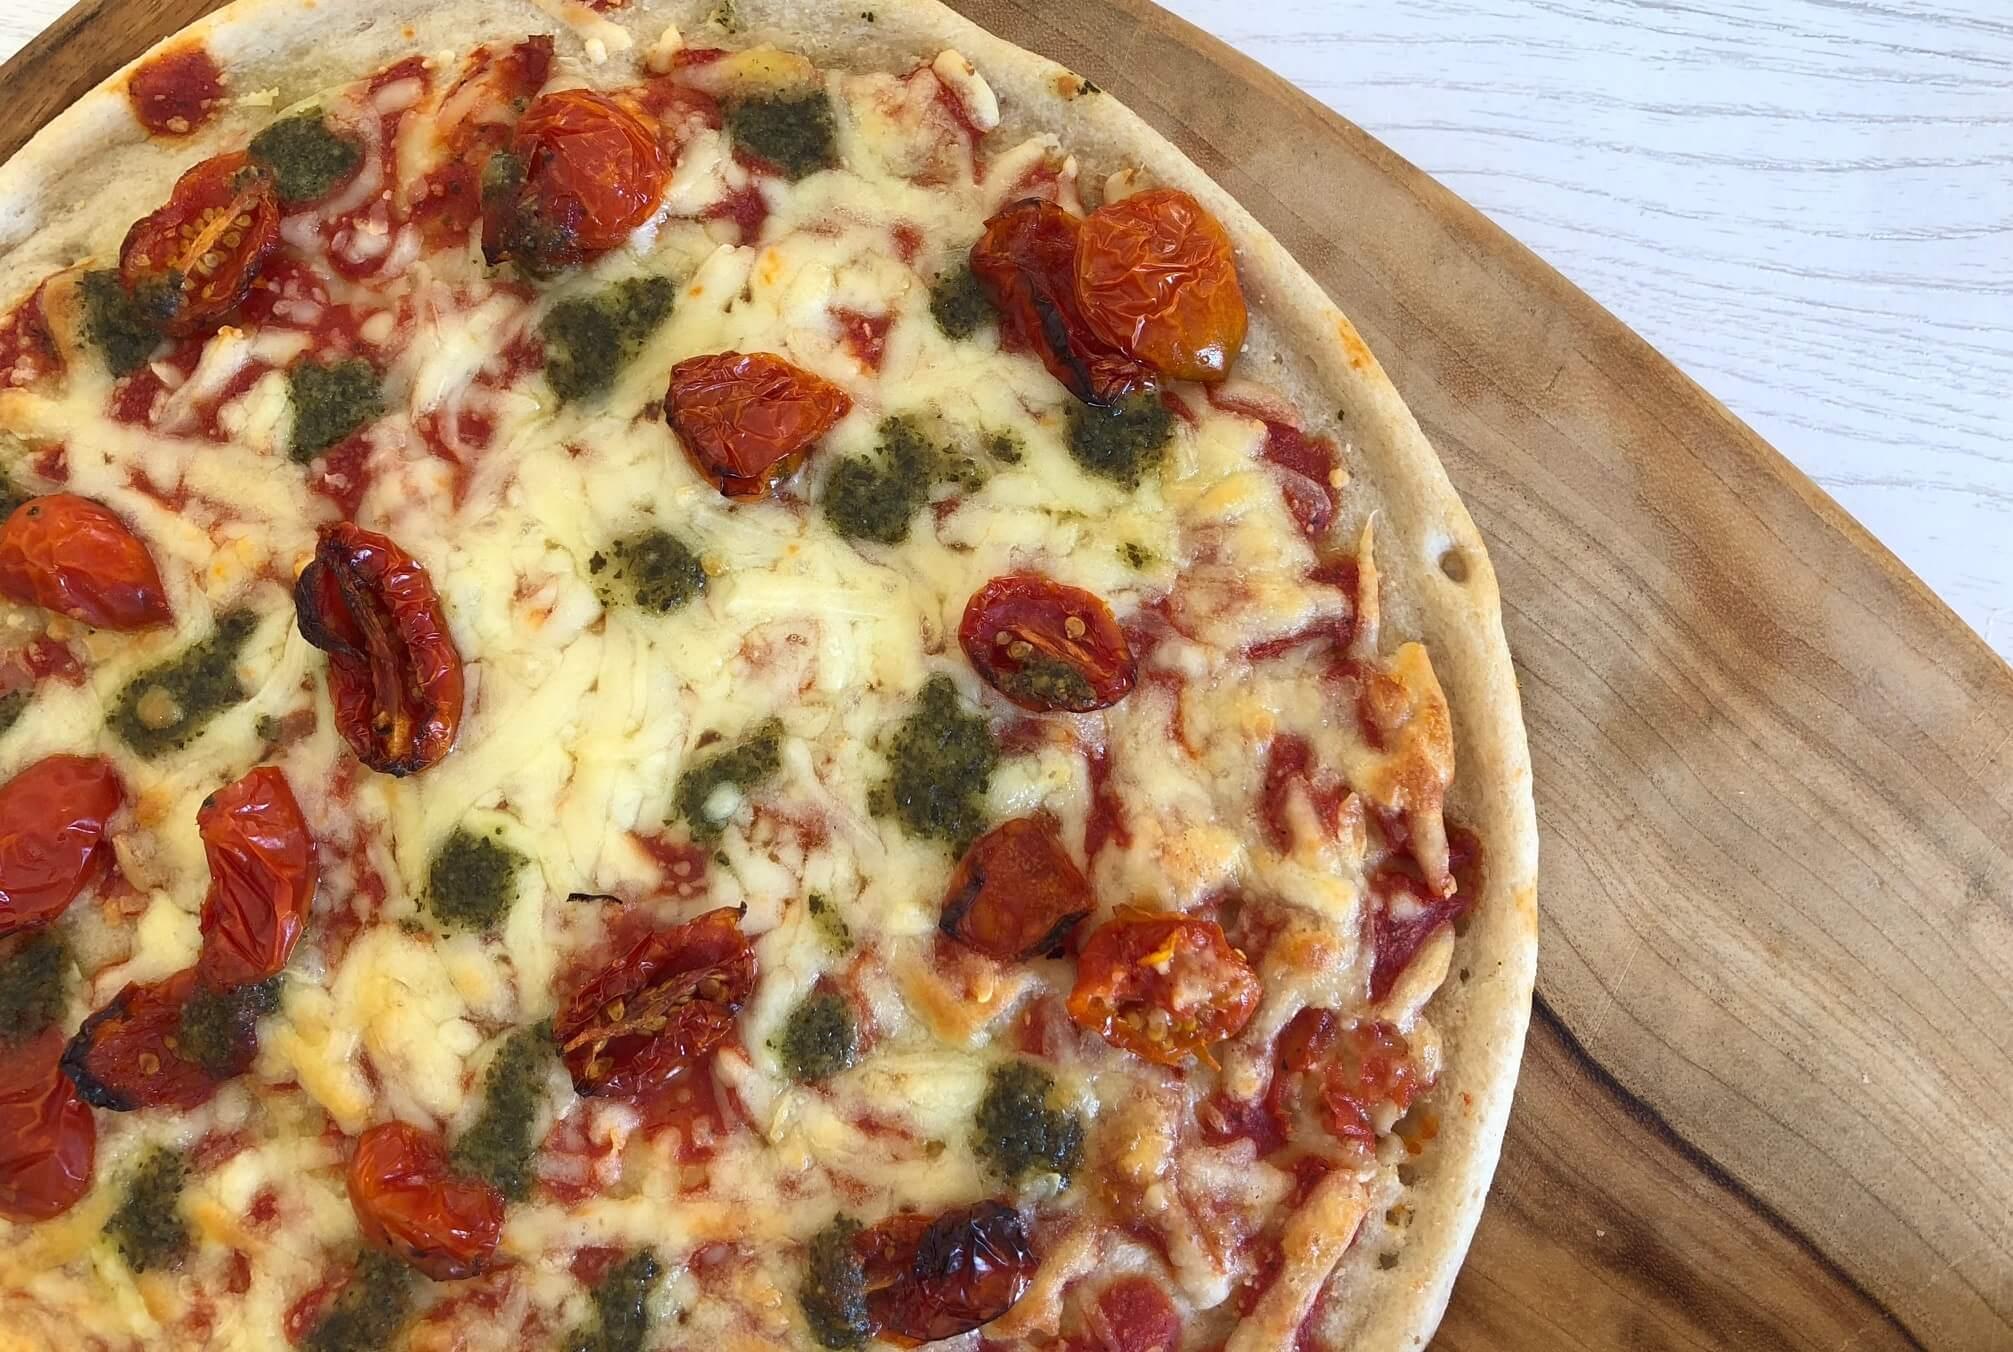 Goodfellas four cheese and basil pesto pizza